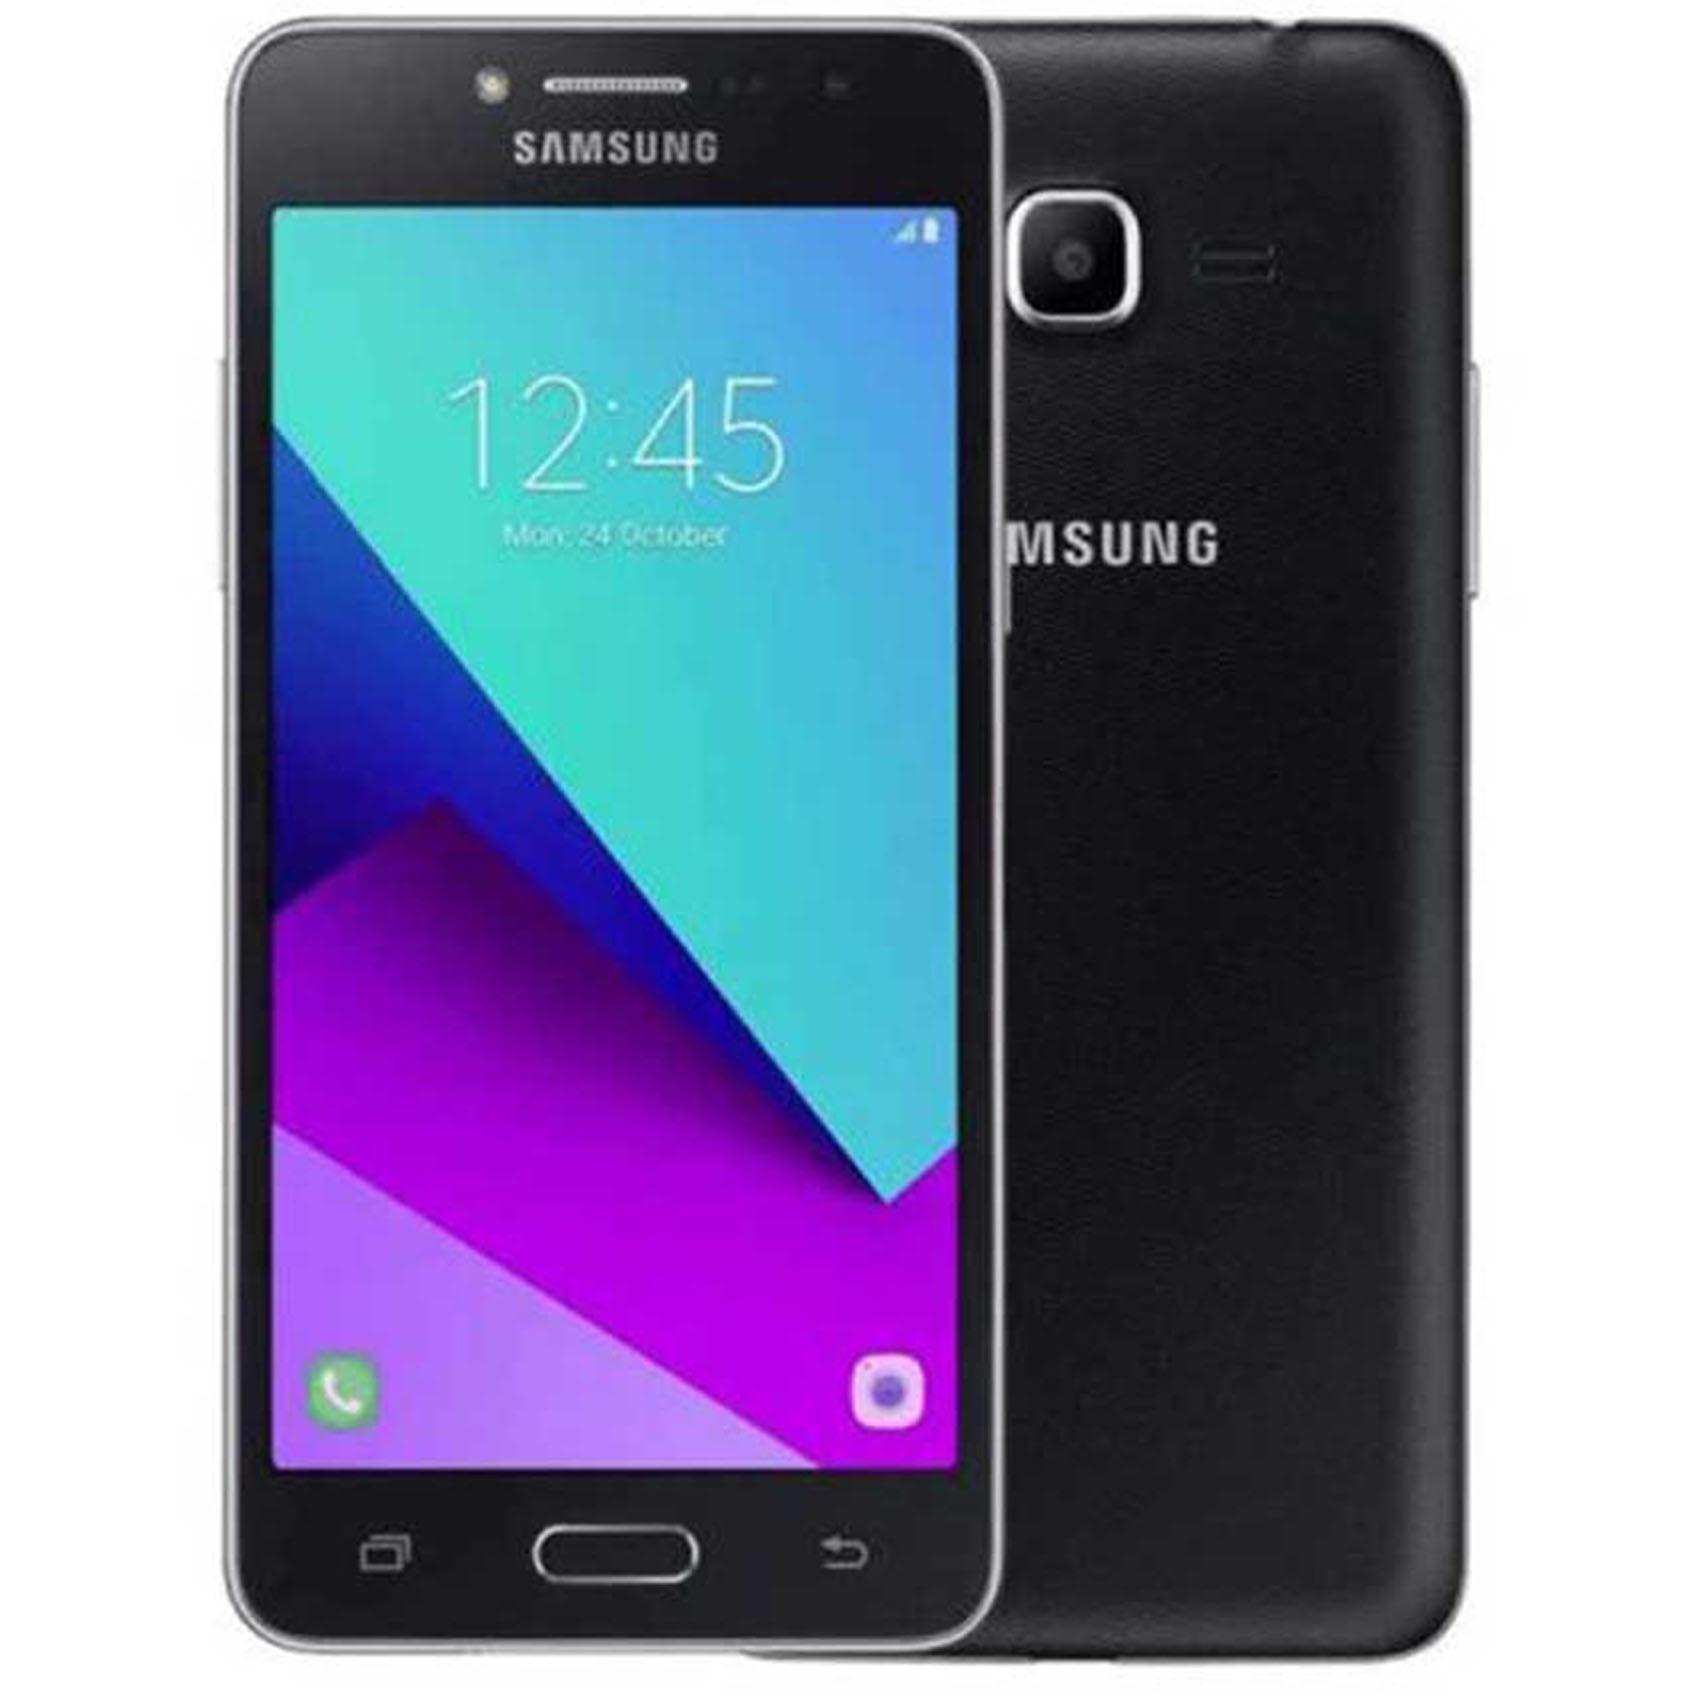 SAMSUNG GRAND PRIME PLUS BLK DS 4G